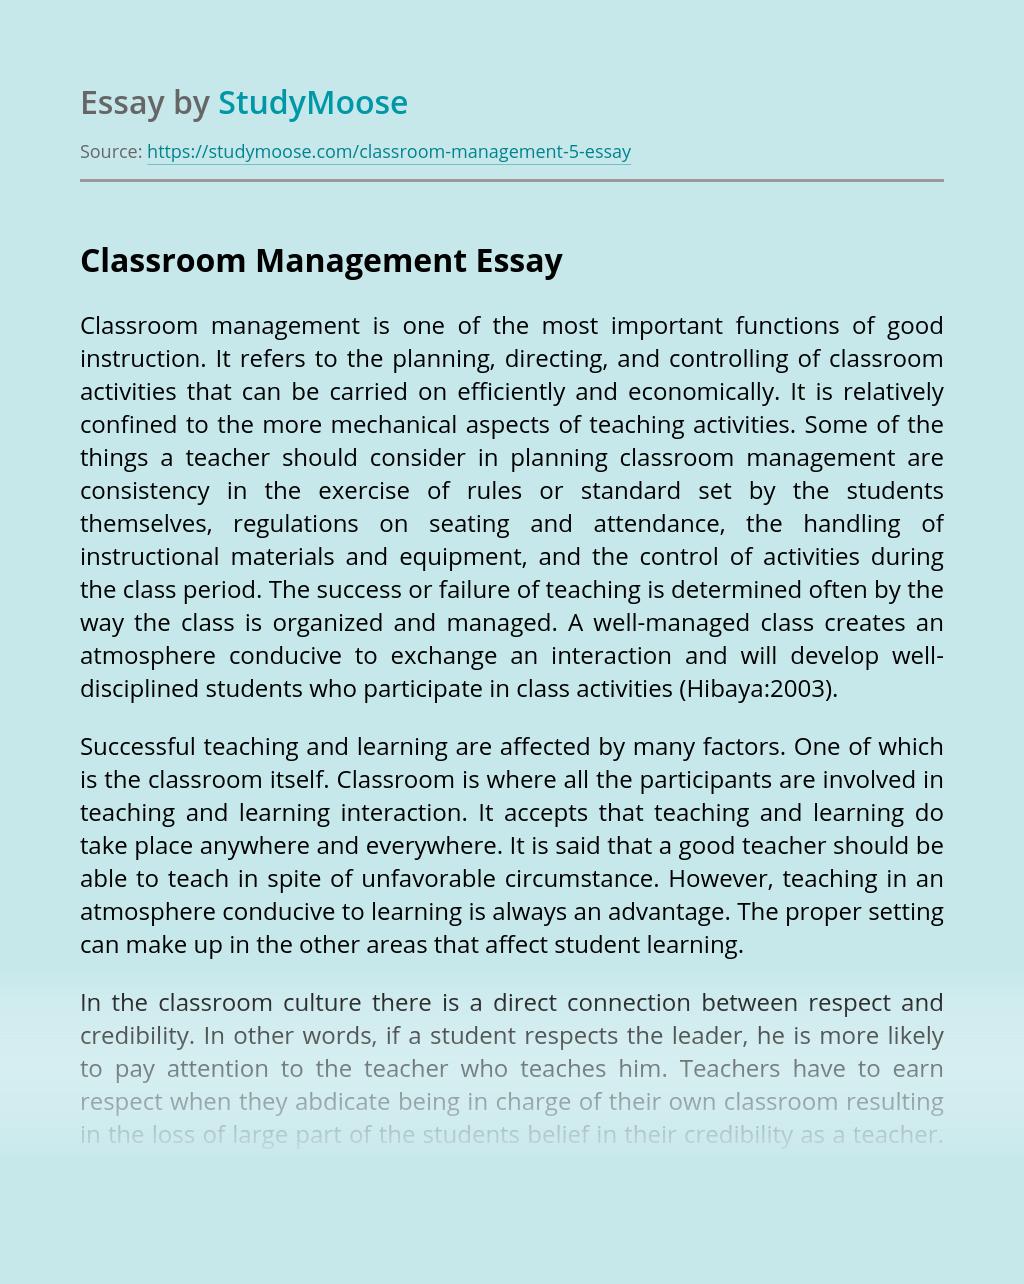 Essay on classroom management